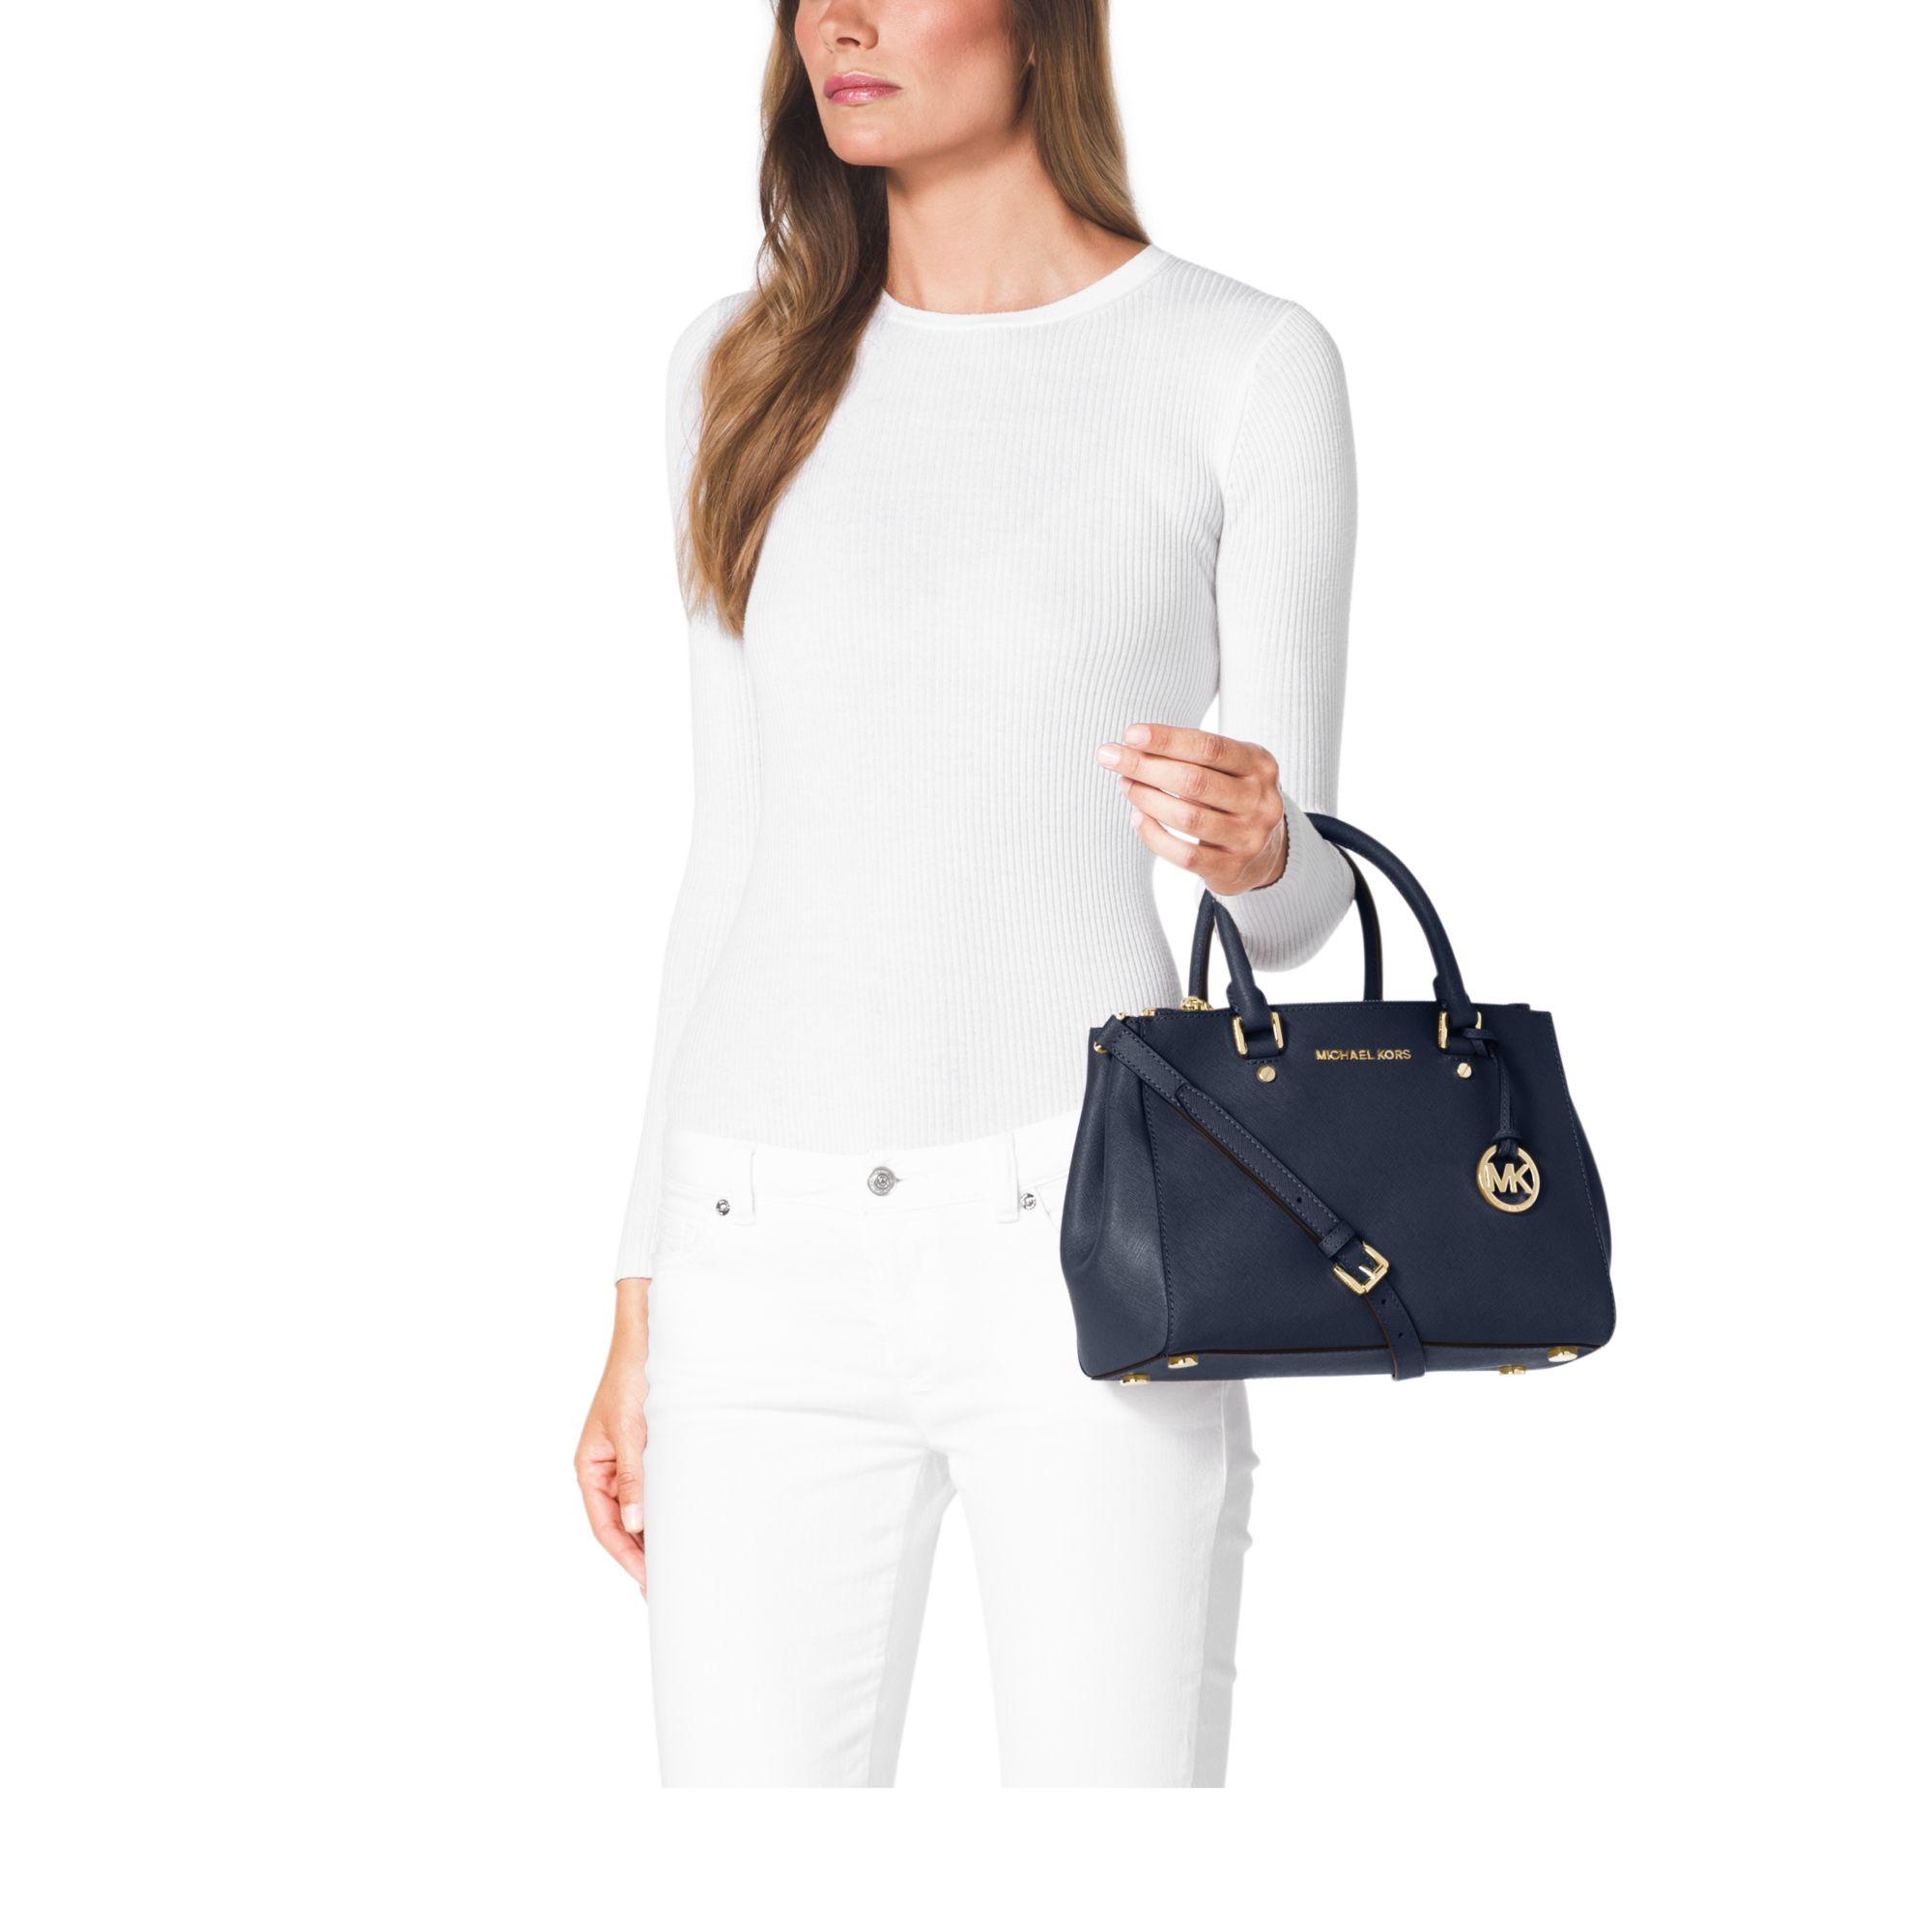 ad3a93555666 Michael Kors Sutton Saffiano Leather Medium Navy Satchel designer handbags  outlet